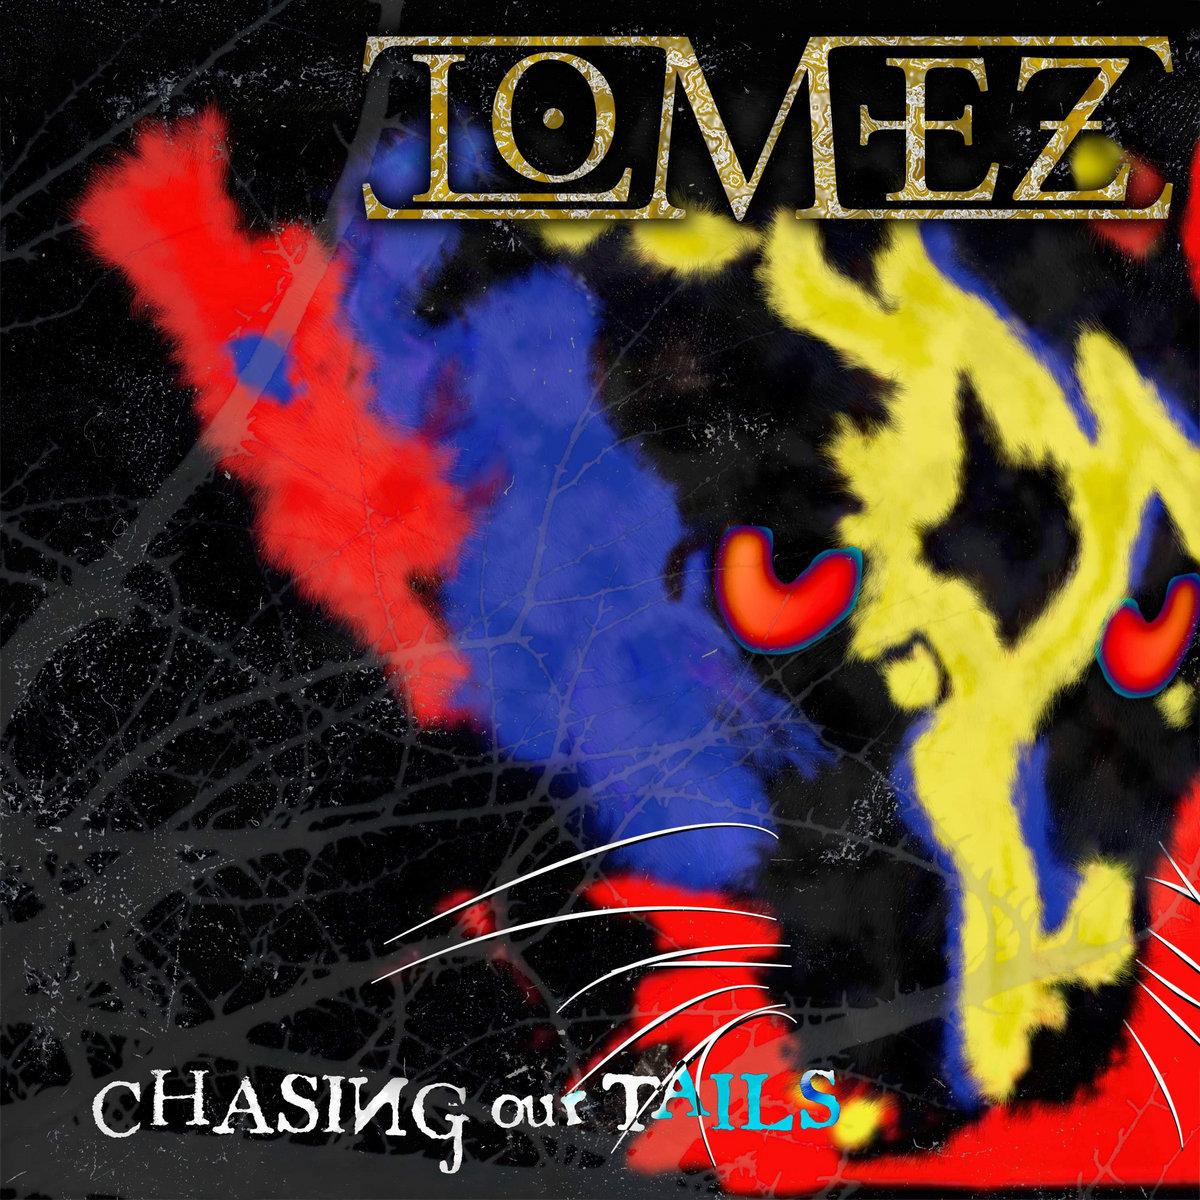 www.facebook.com/lomezband